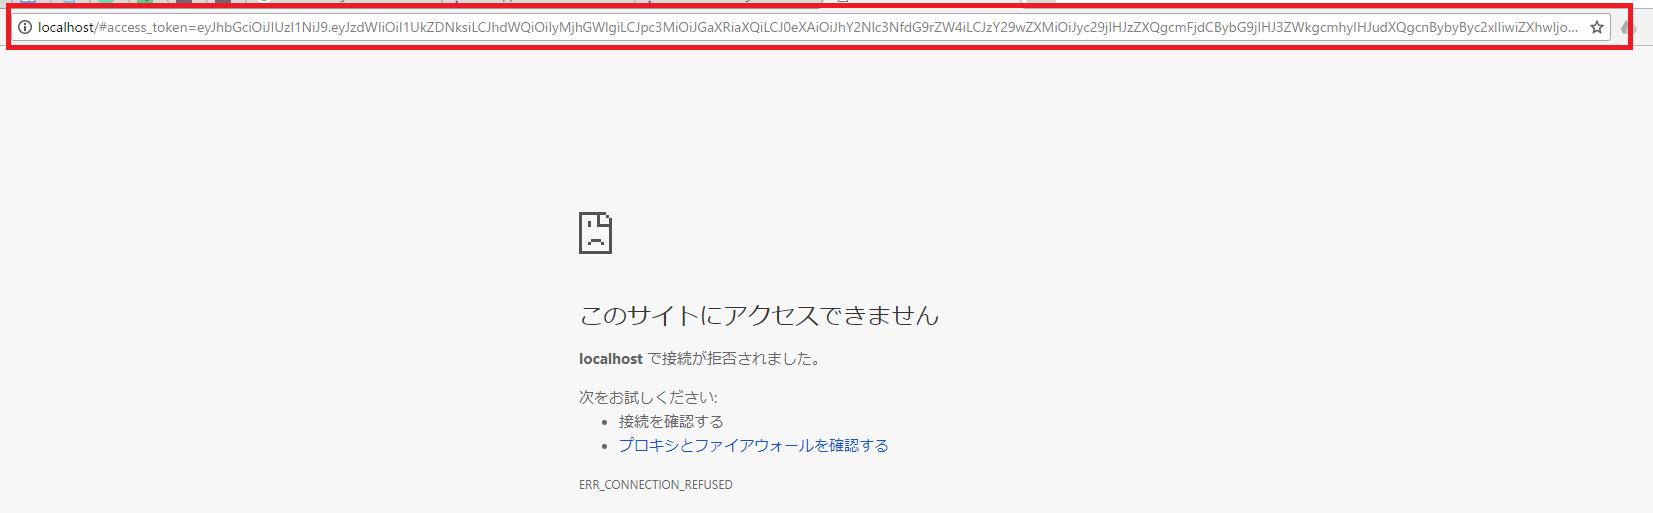 URL表示